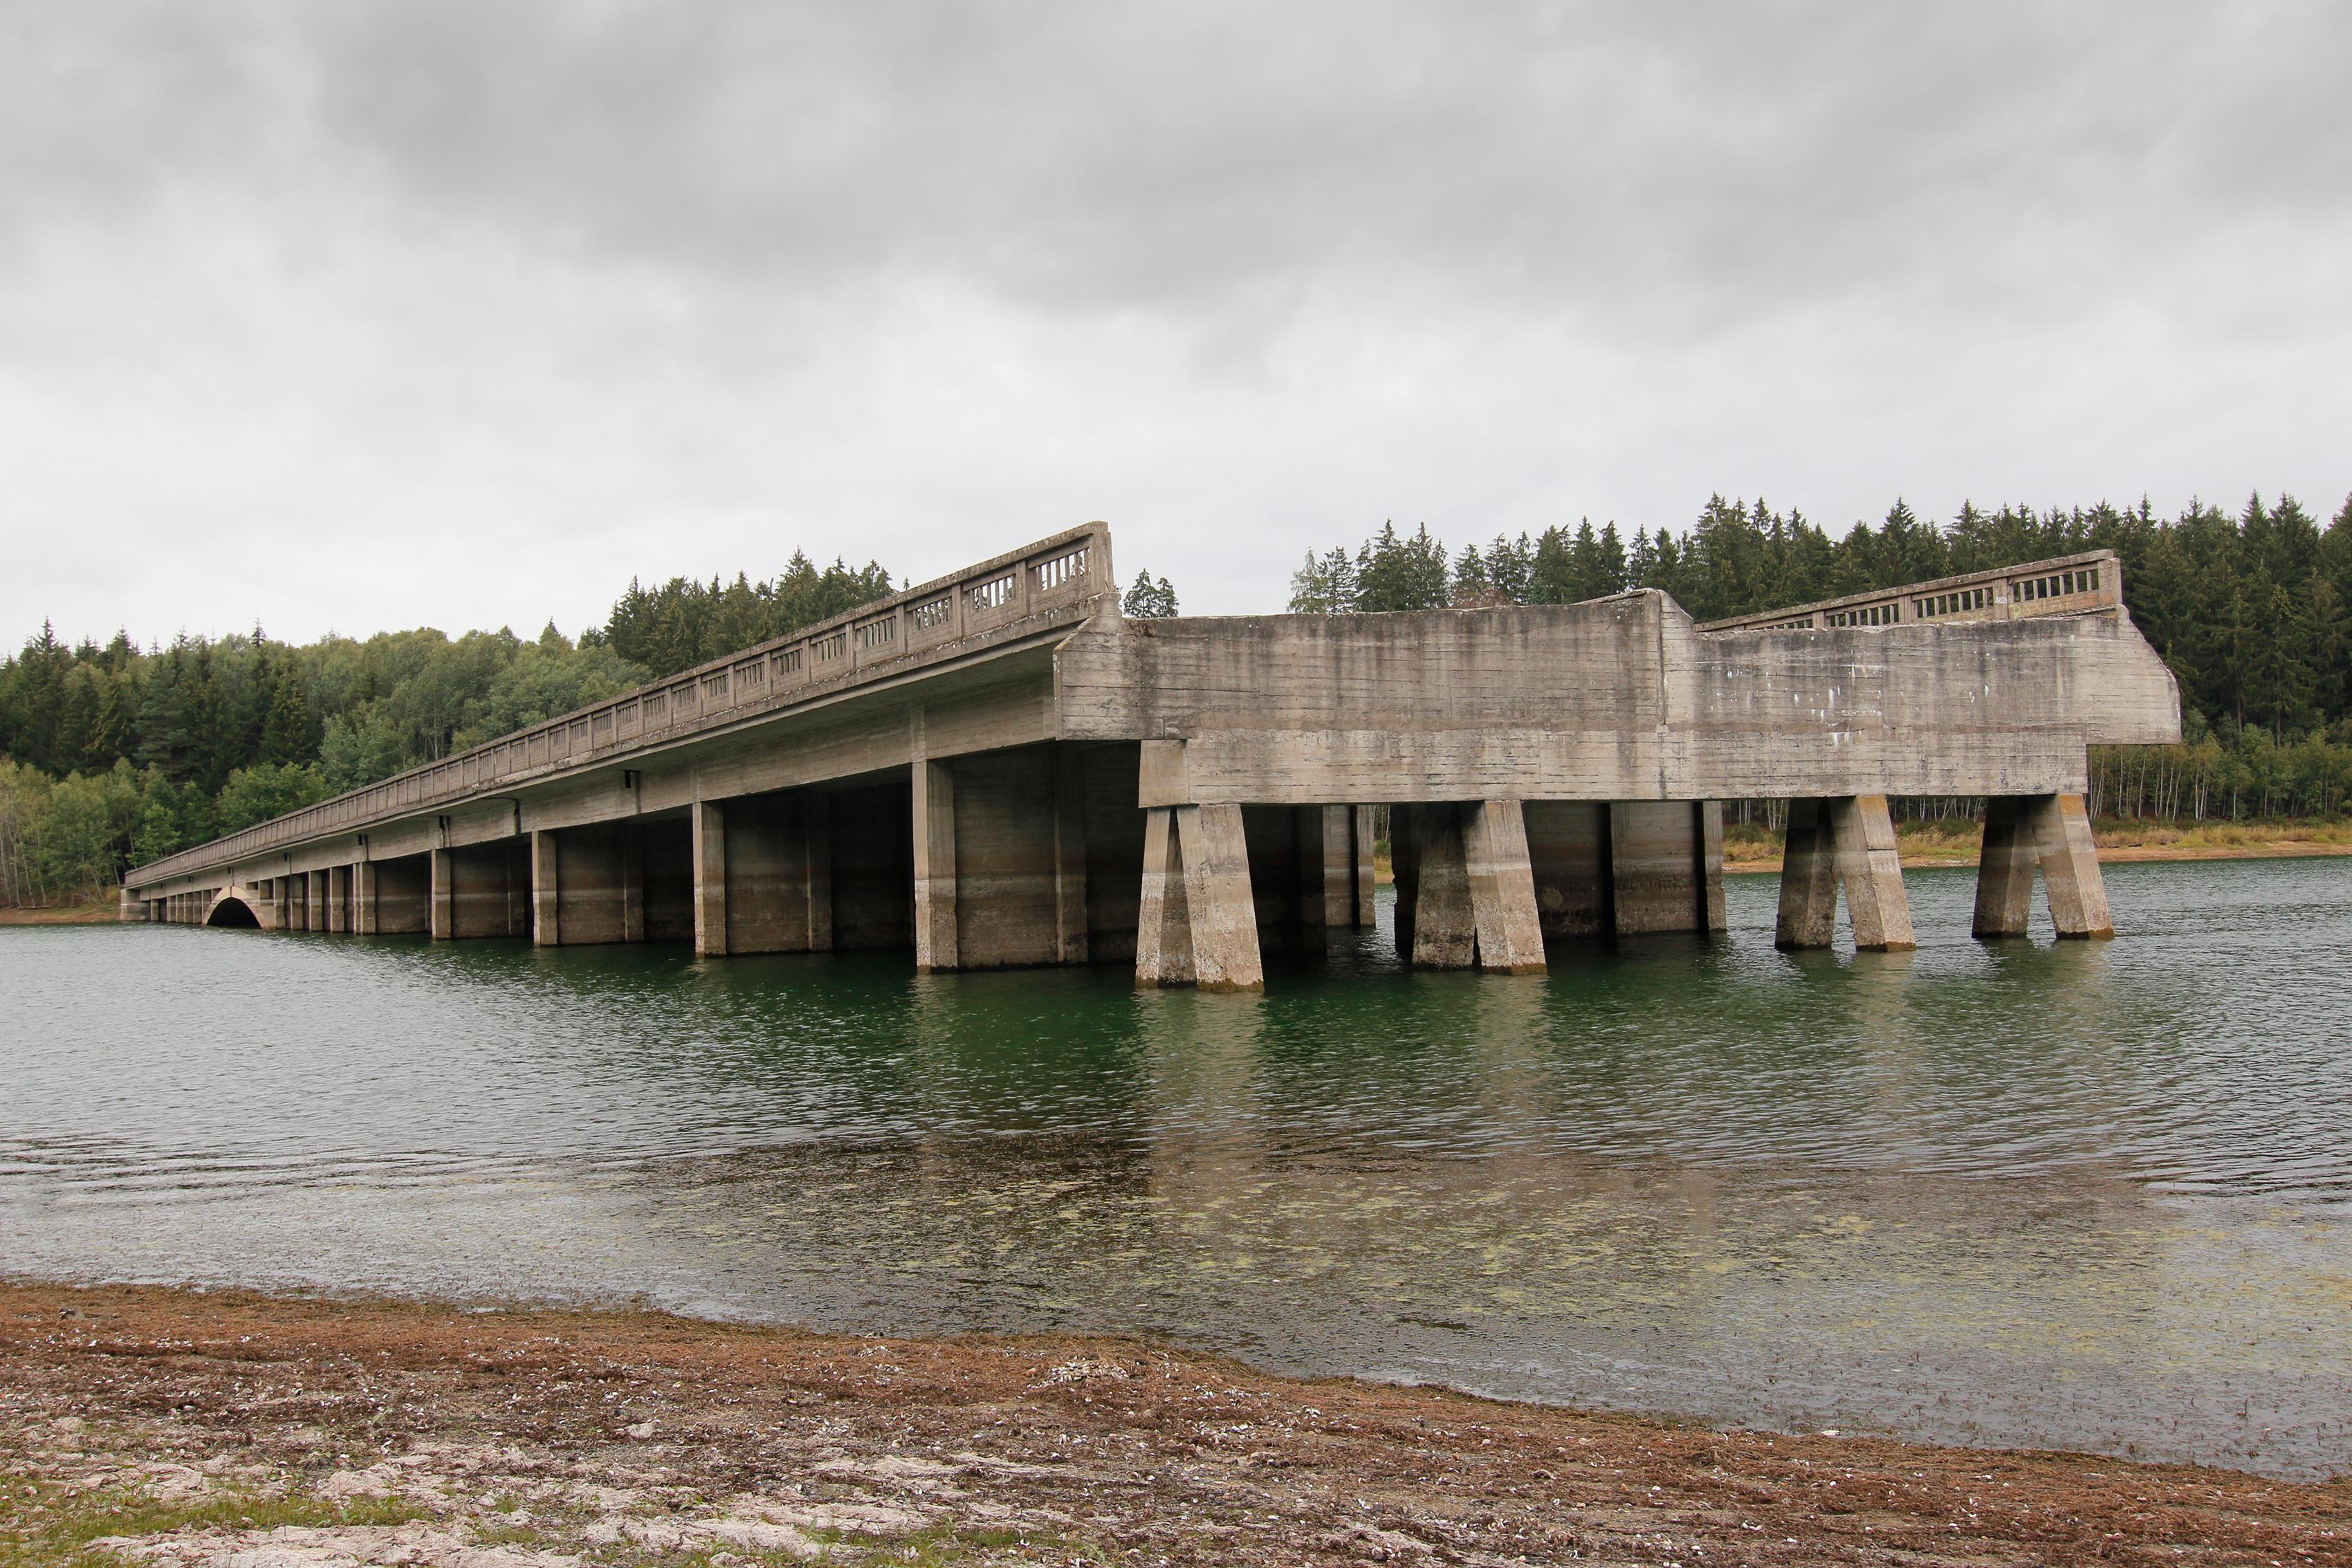 Unfinished bridge stops mid-stream